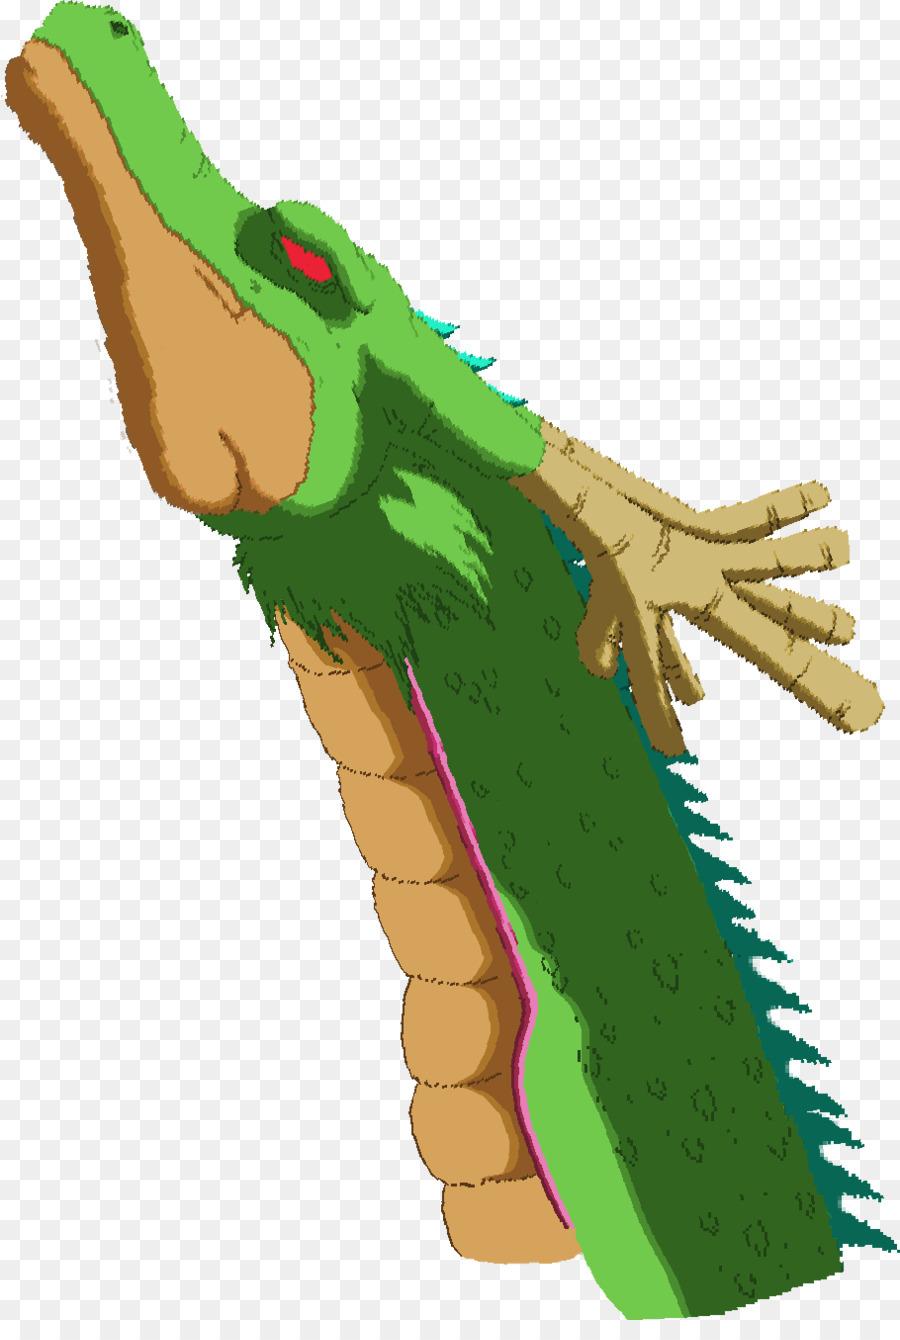 M U G E N Nappa Piccolo Shenron Goku Pink Shading Background Png